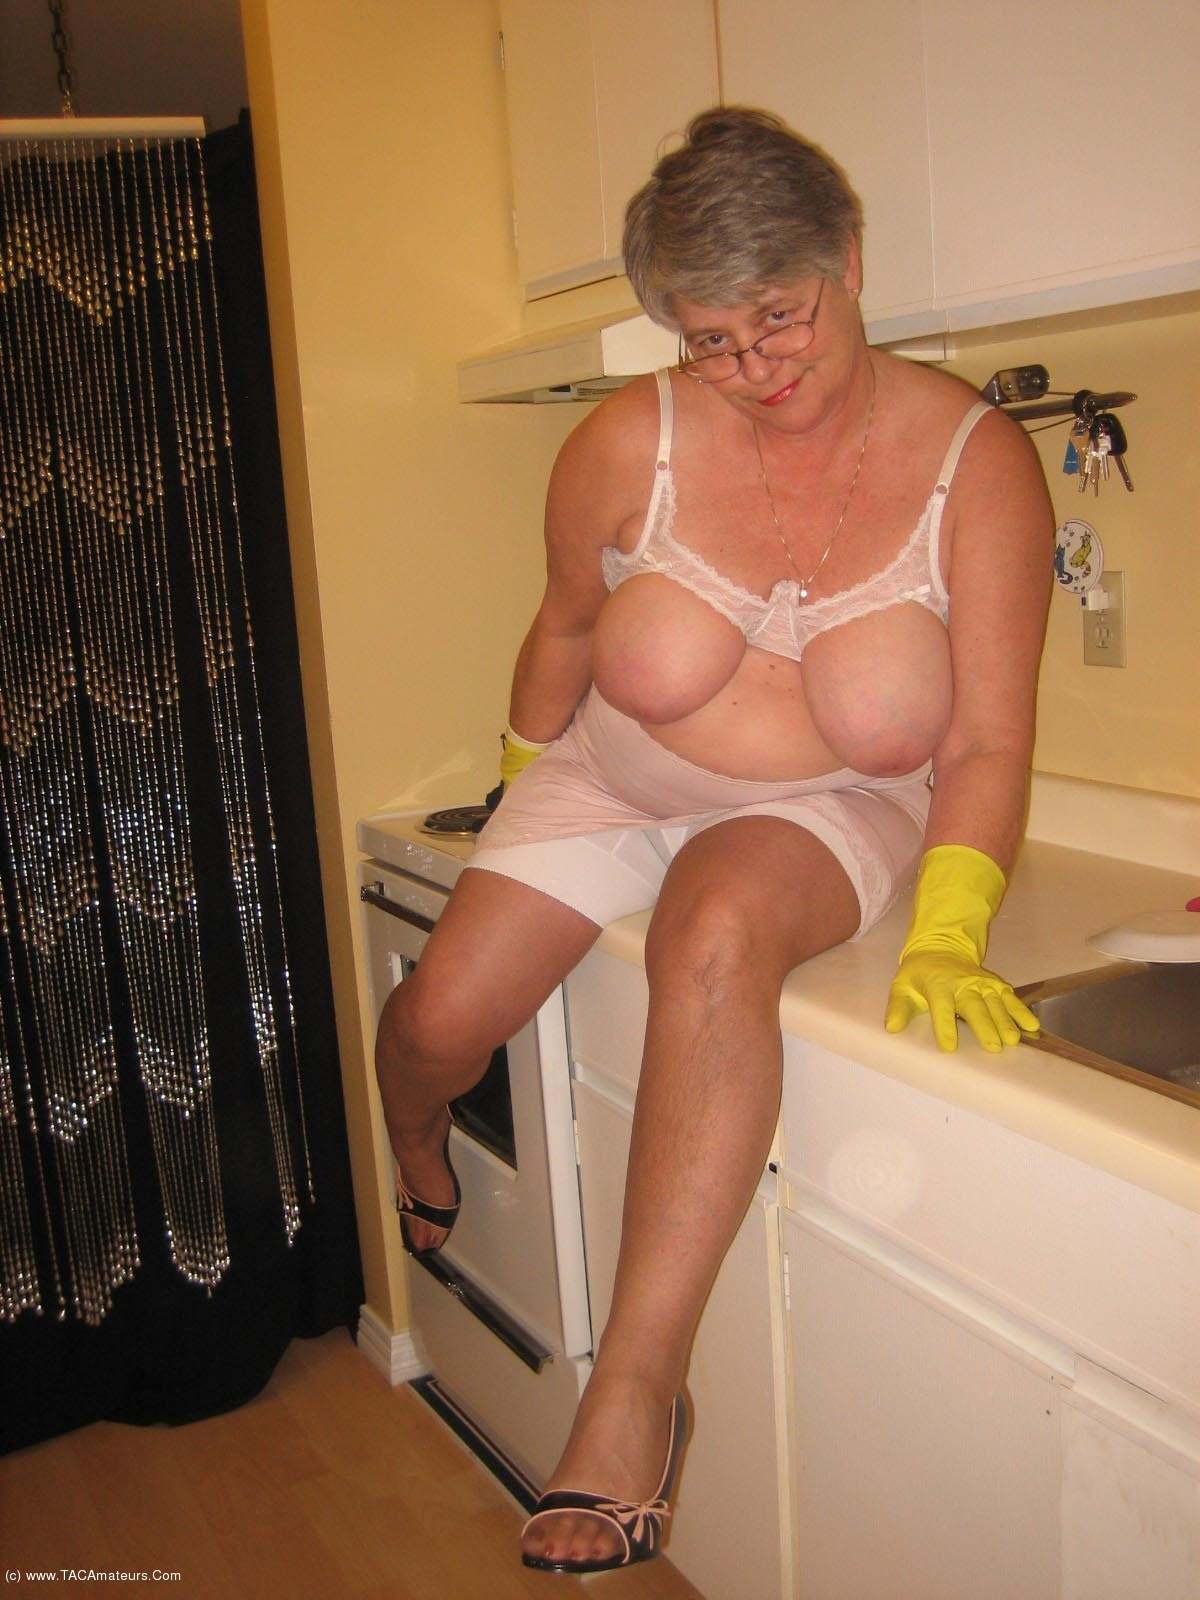 Goddess granny amateurs girdle tac